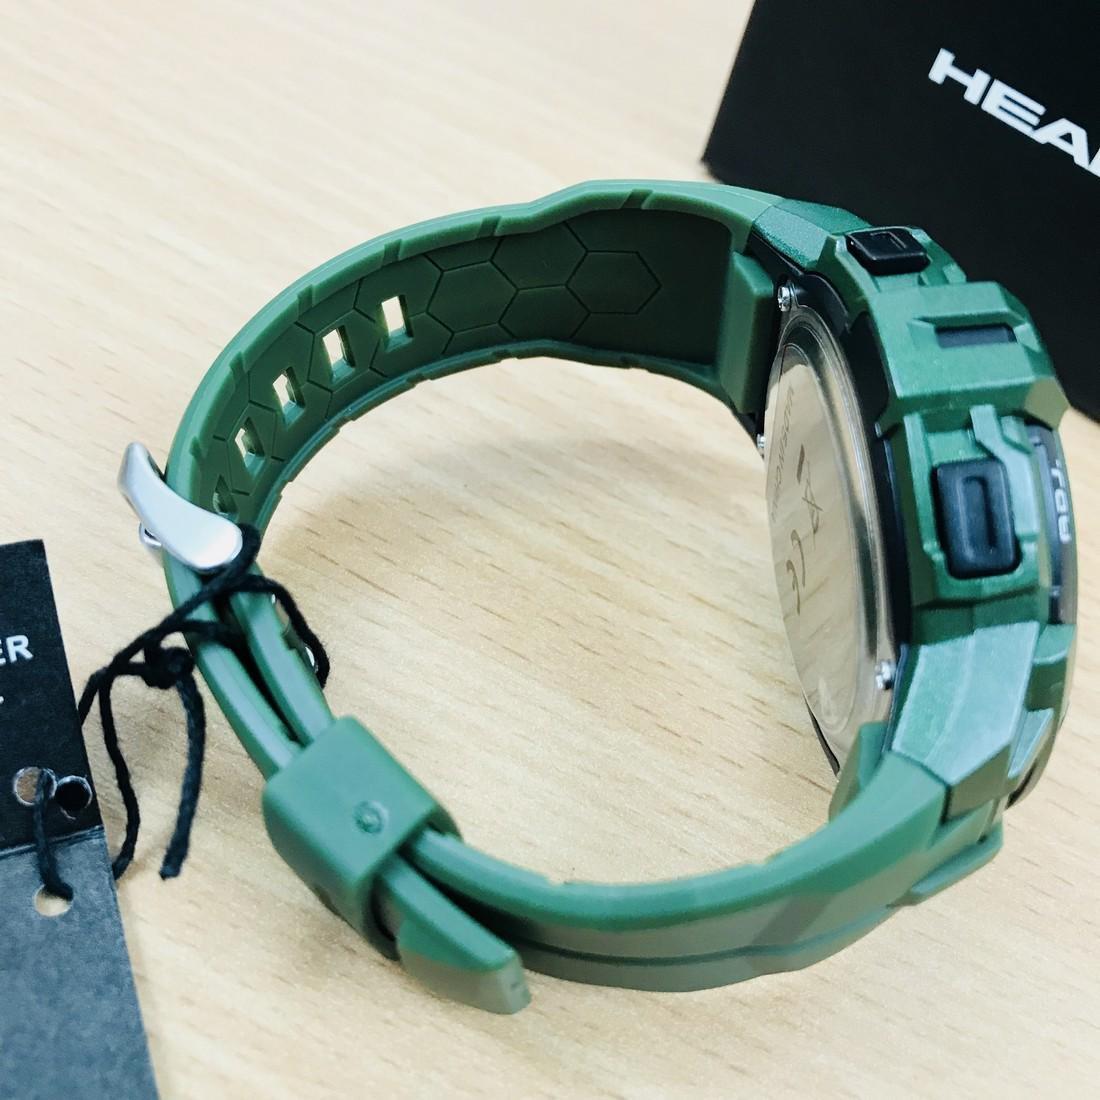 HEAD Super G Green Multifunctional Watch - 9